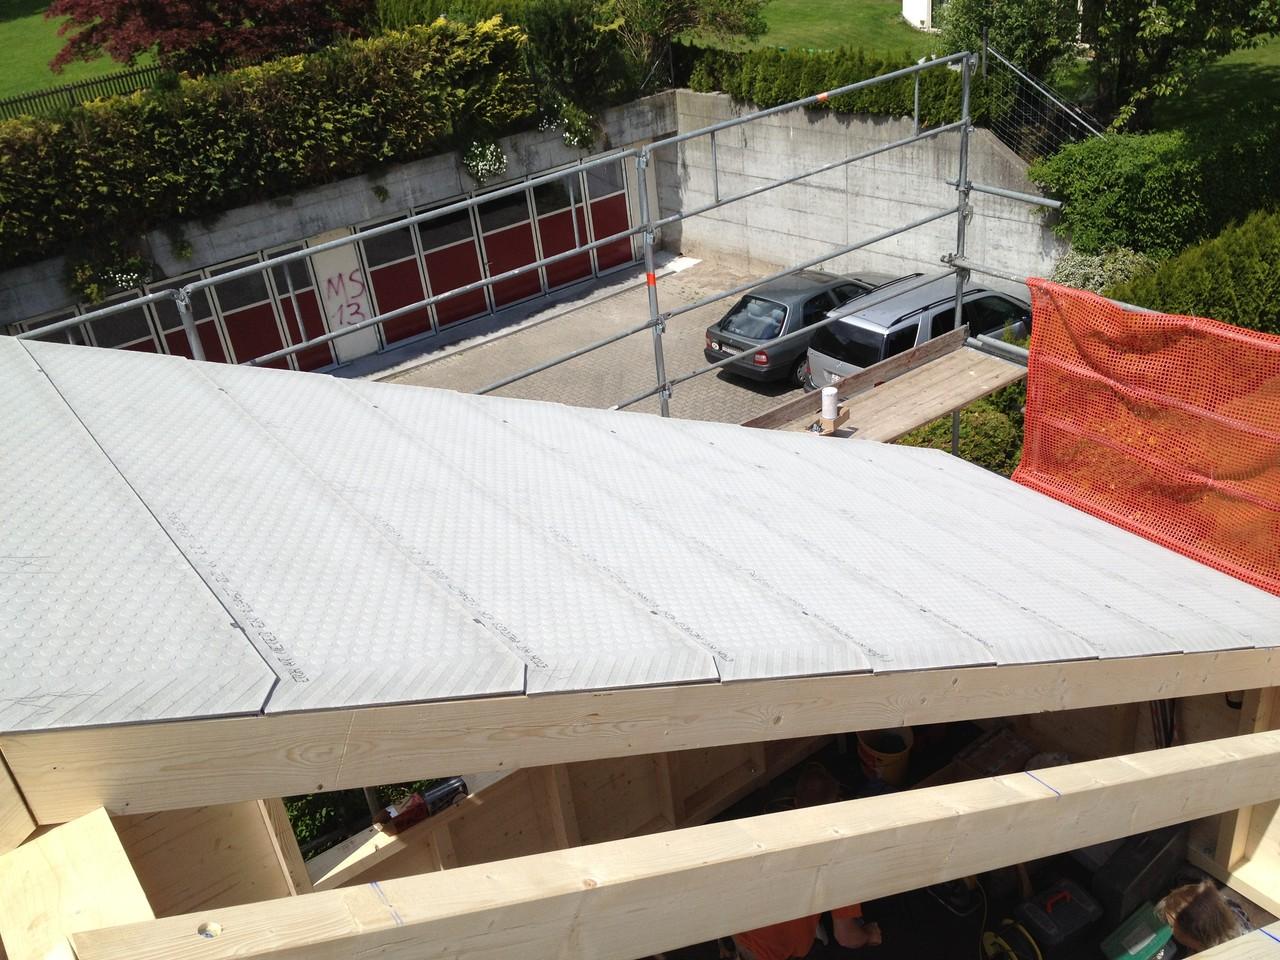 Anbau an bestehendes Haus, Unterdach